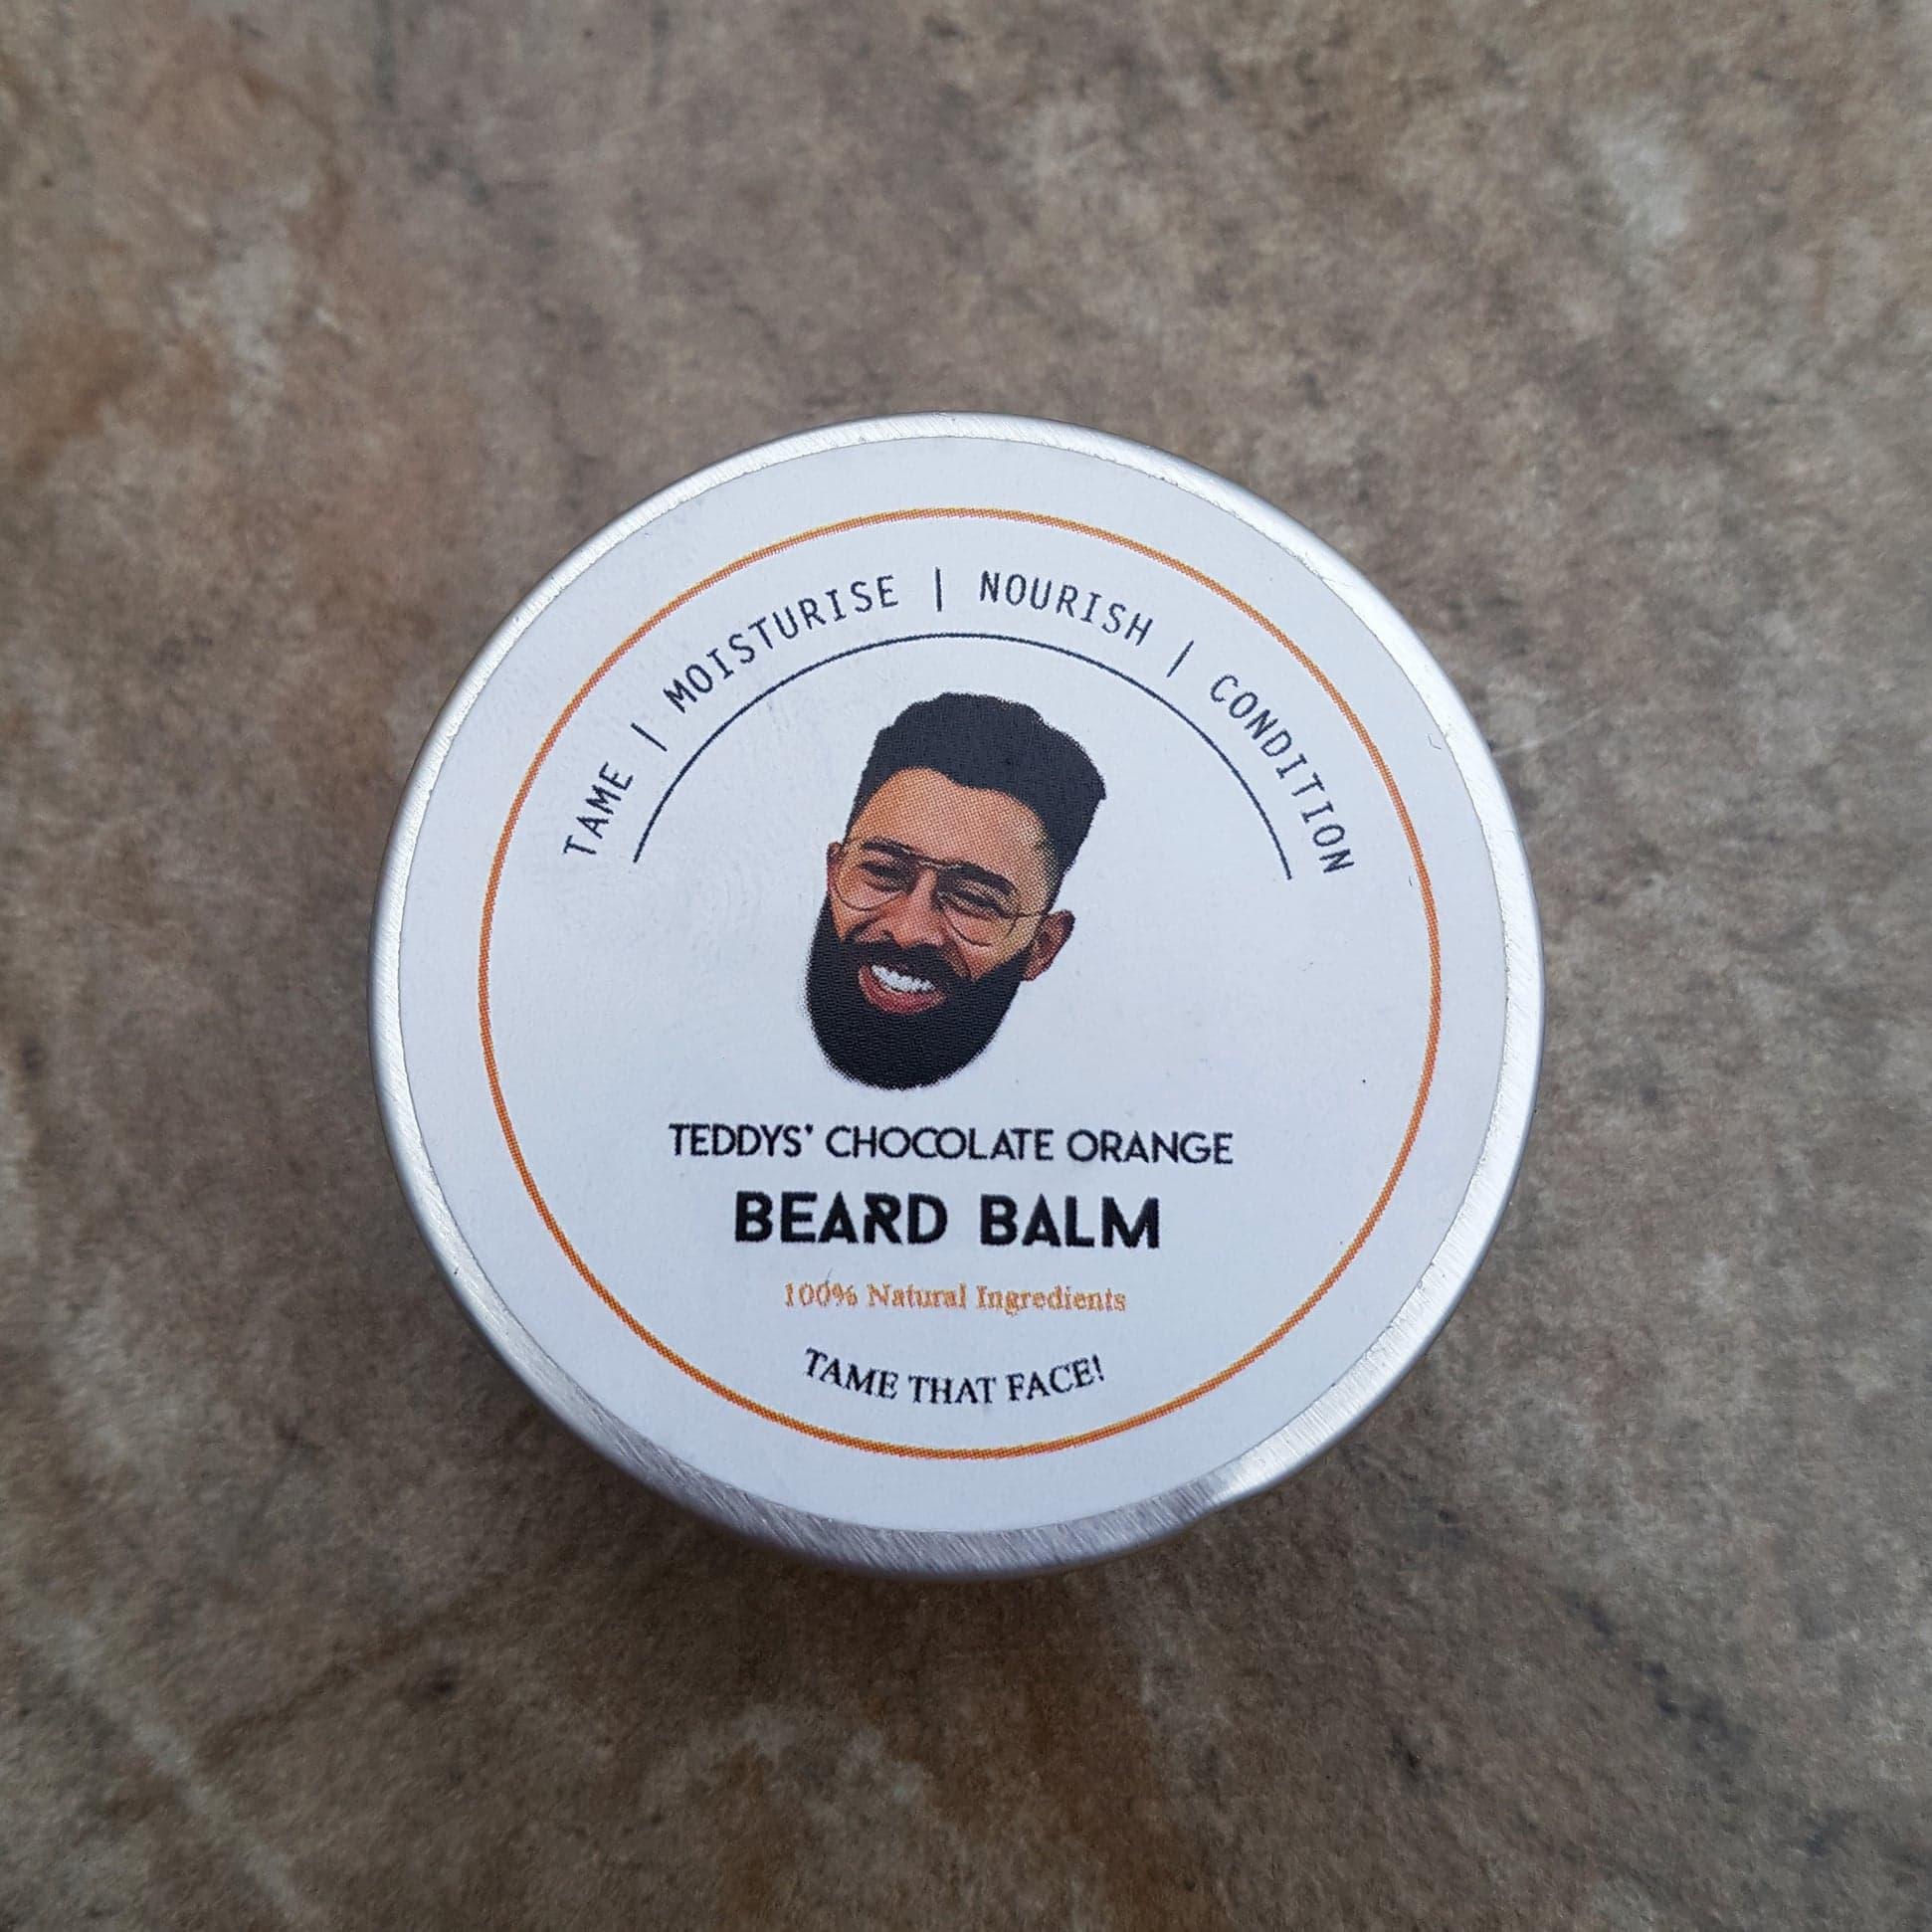 Review of the Teddy's Chocolate Orange Beard Balm